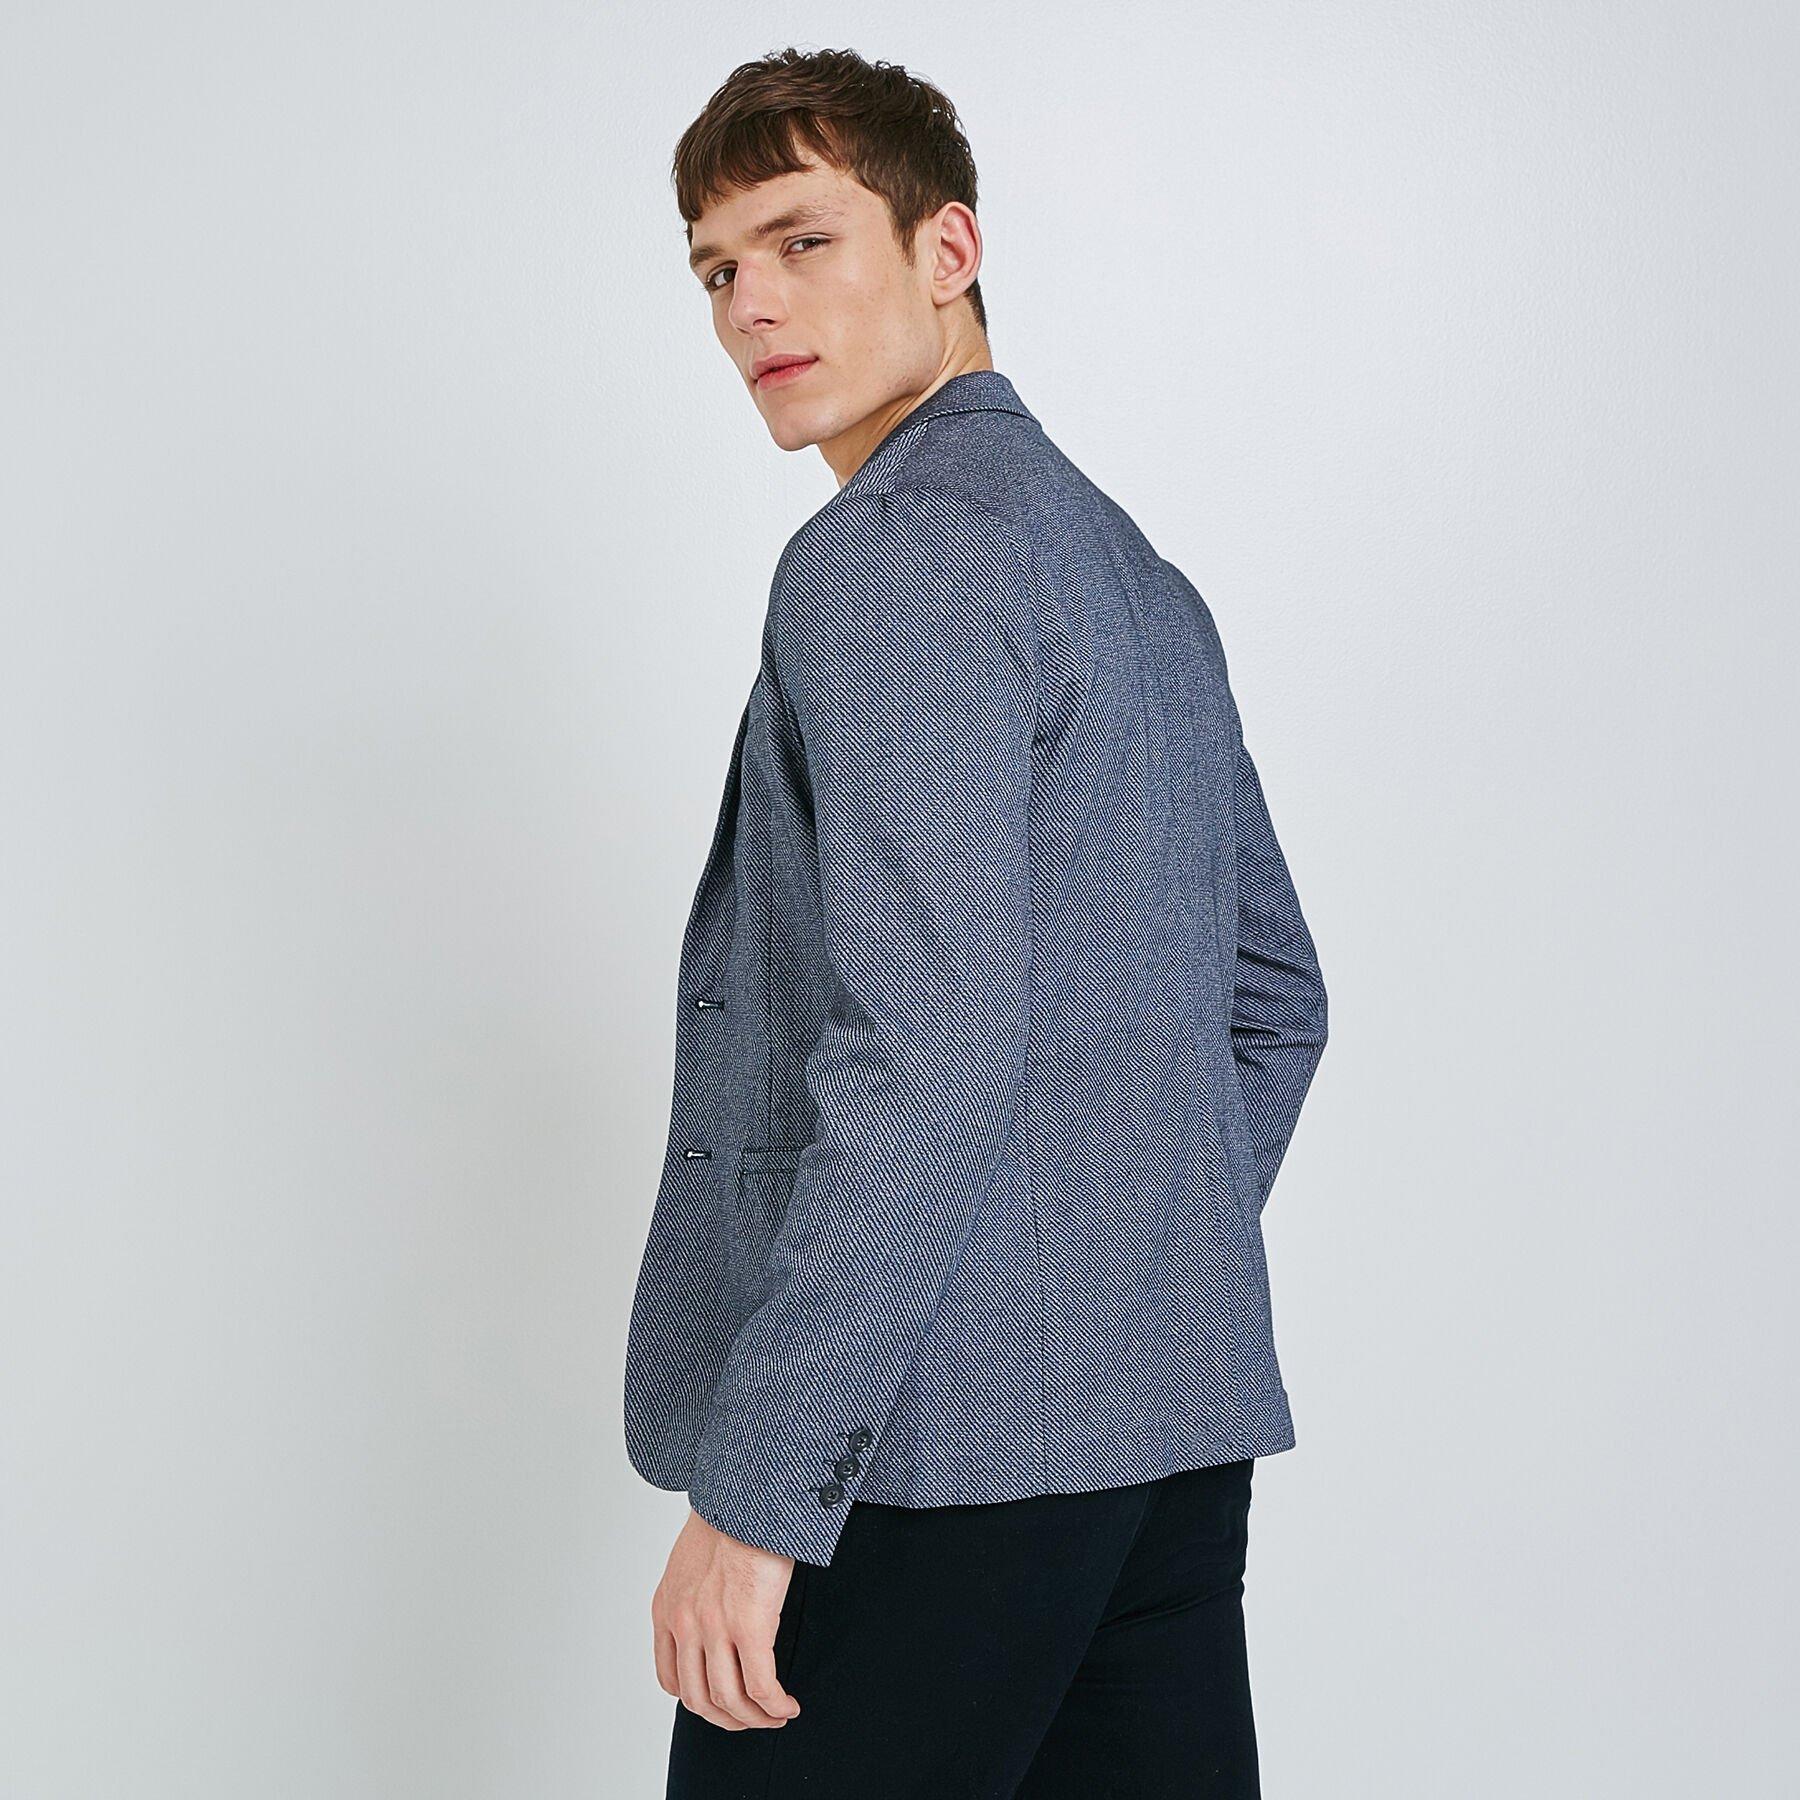 Veste de tailleur en jean